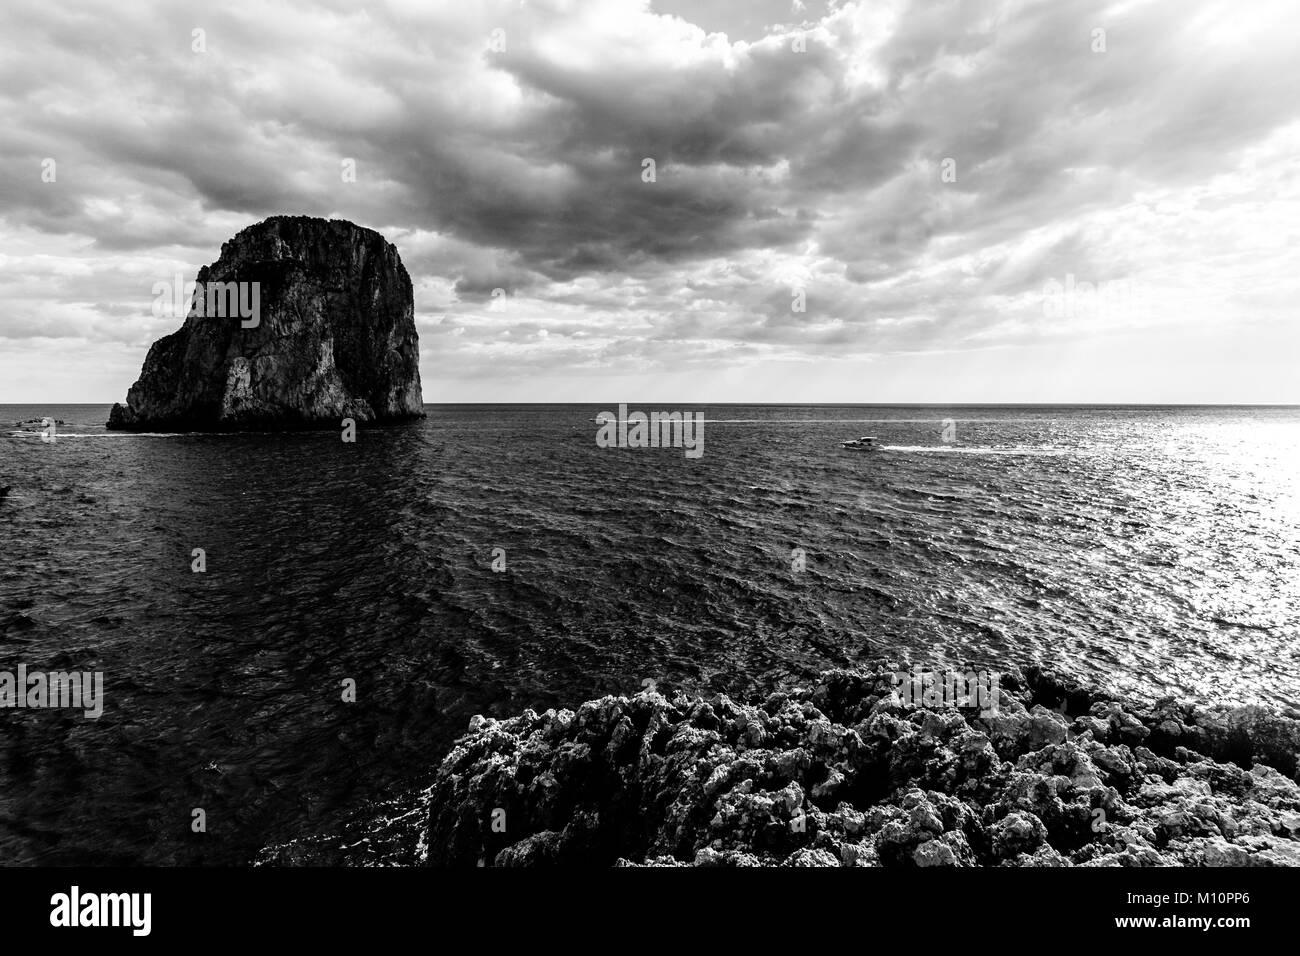 788c523621f4b Capri Black and White Stock Photos   Images - Alamy